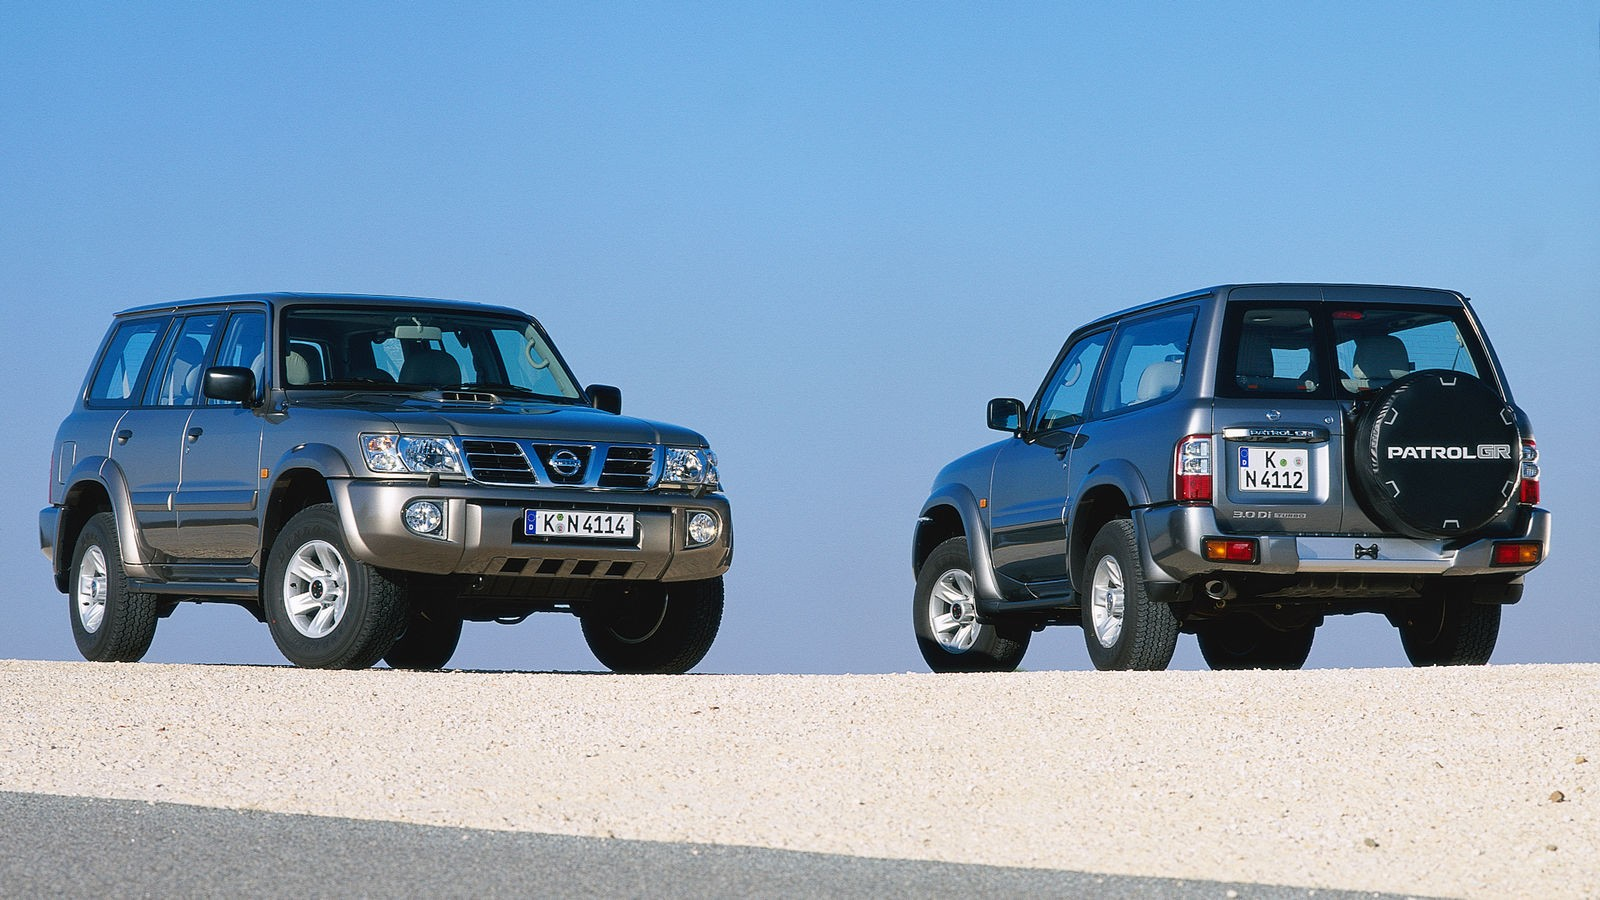 Nissan Patrol GR Elegance